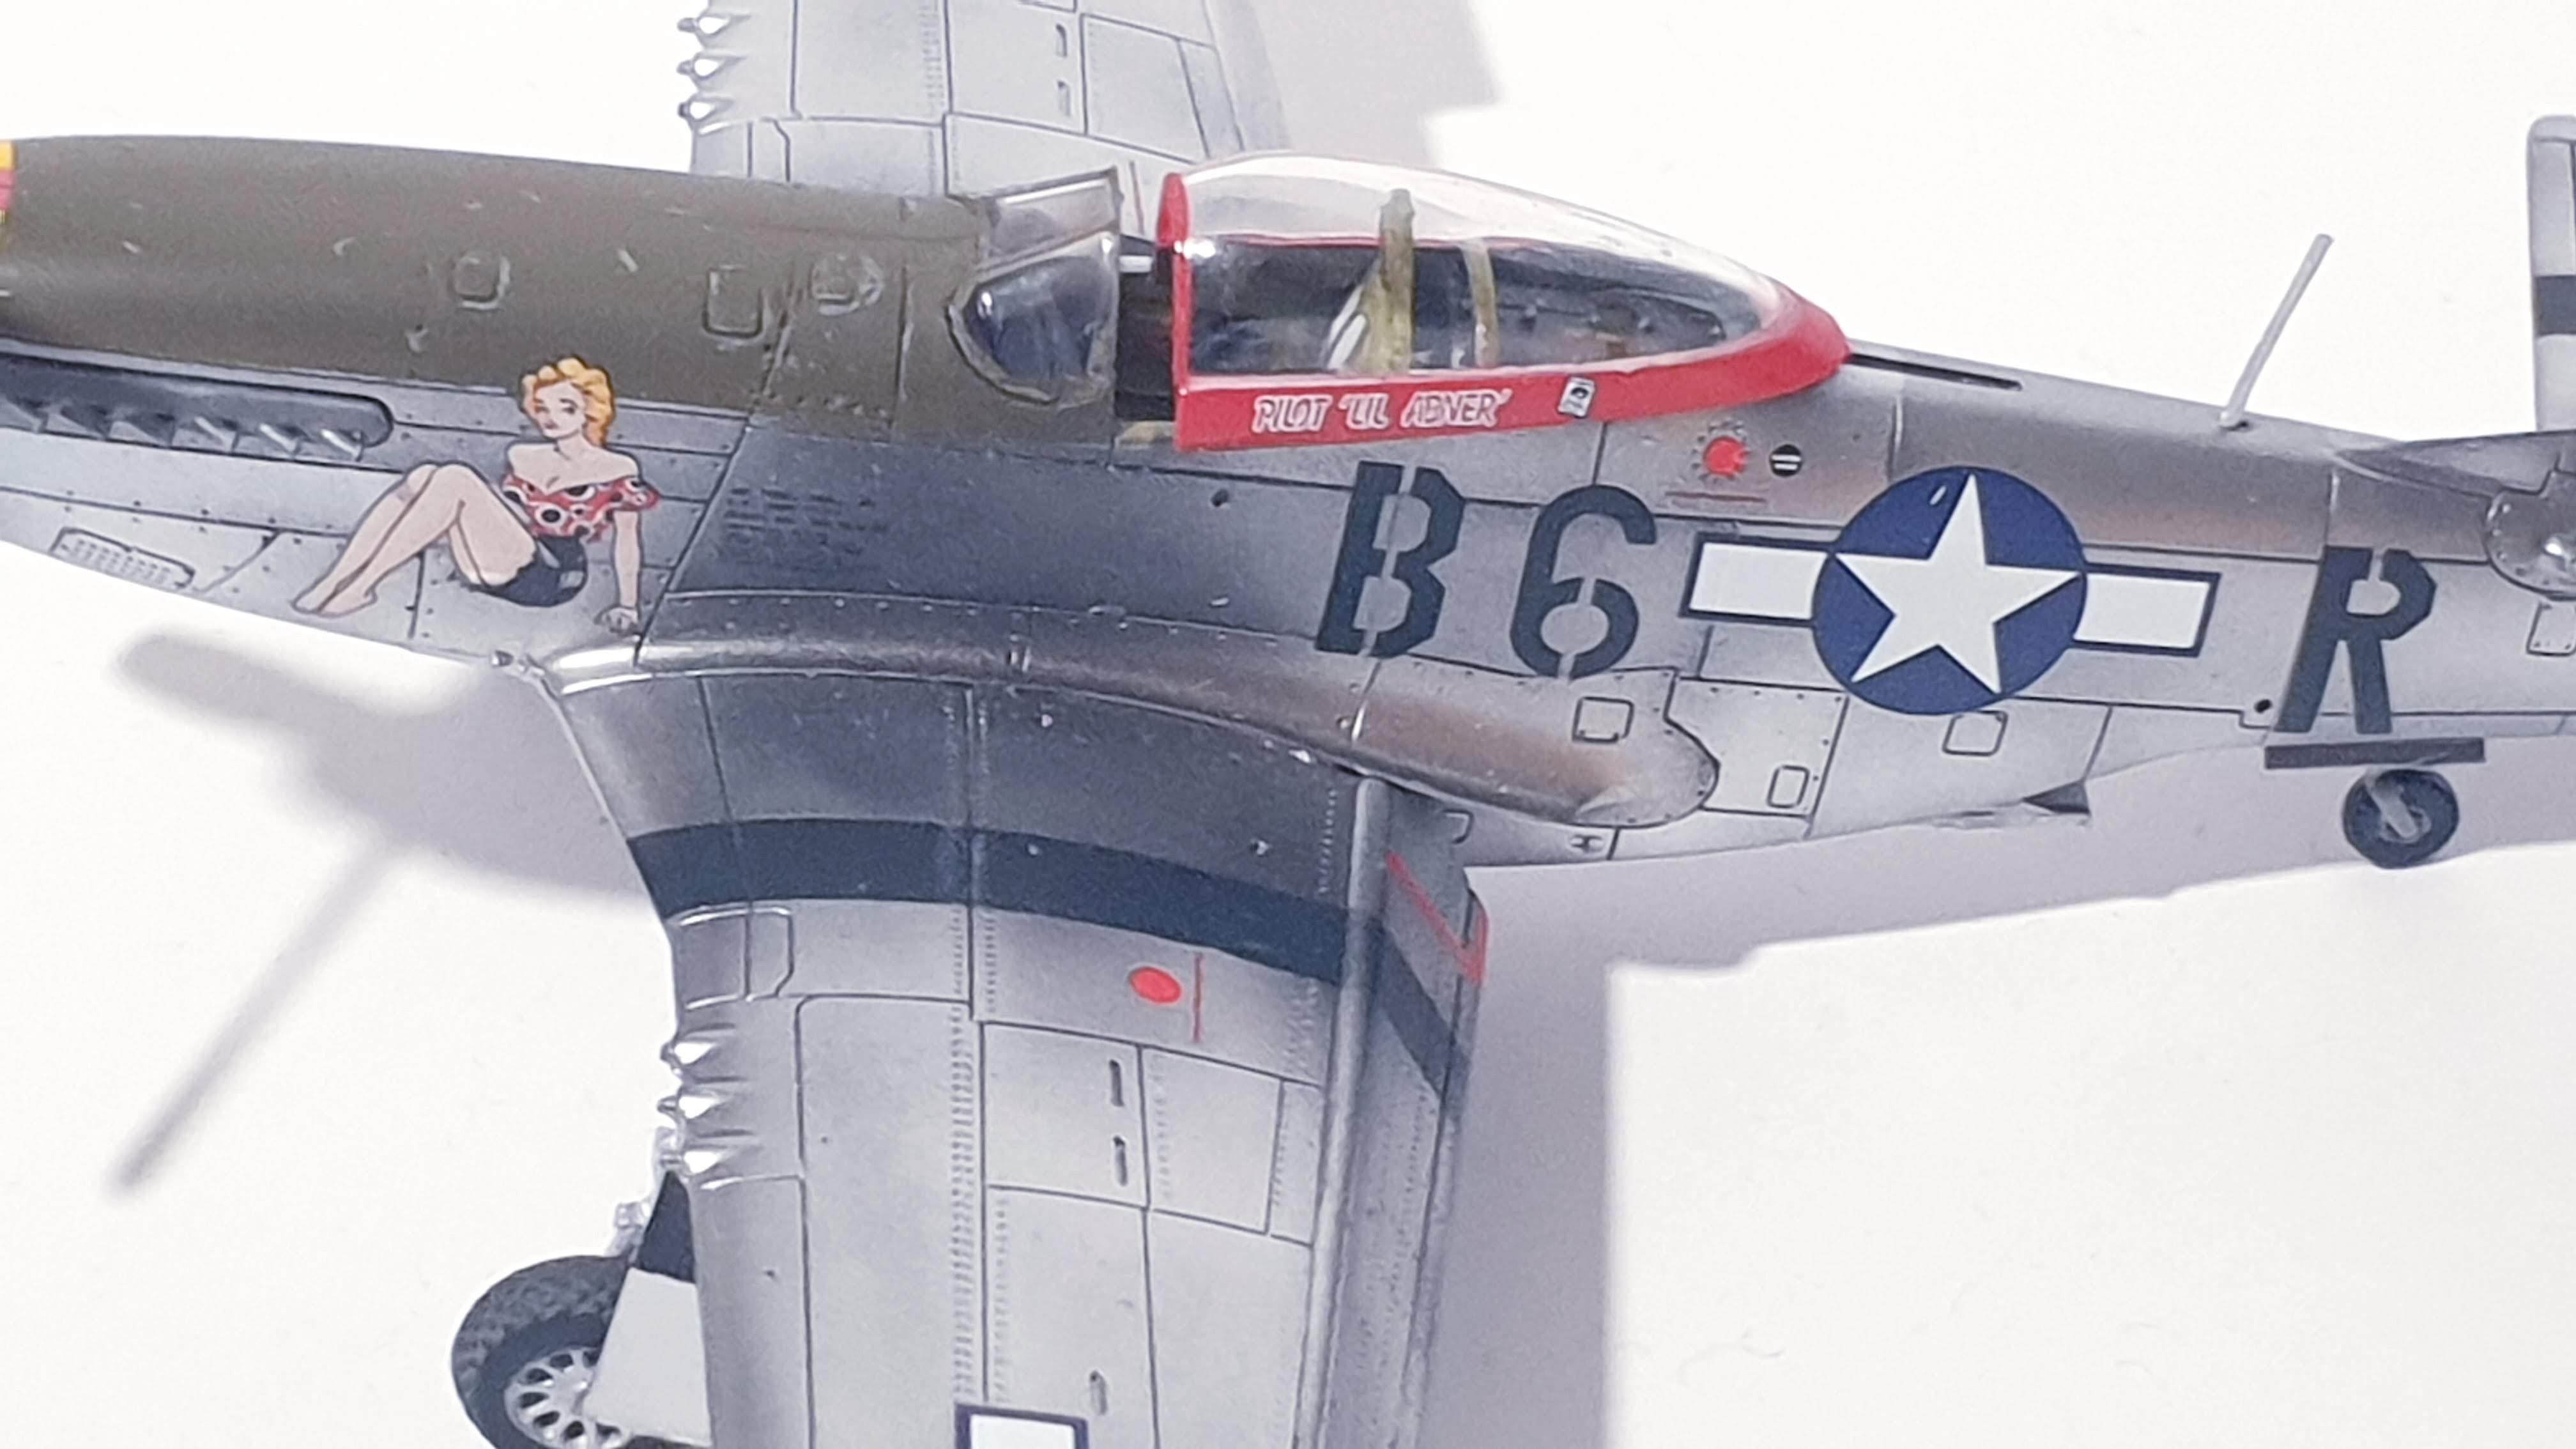 [Airfix] P-51D Mustang Daisy Mae 20201018_191517